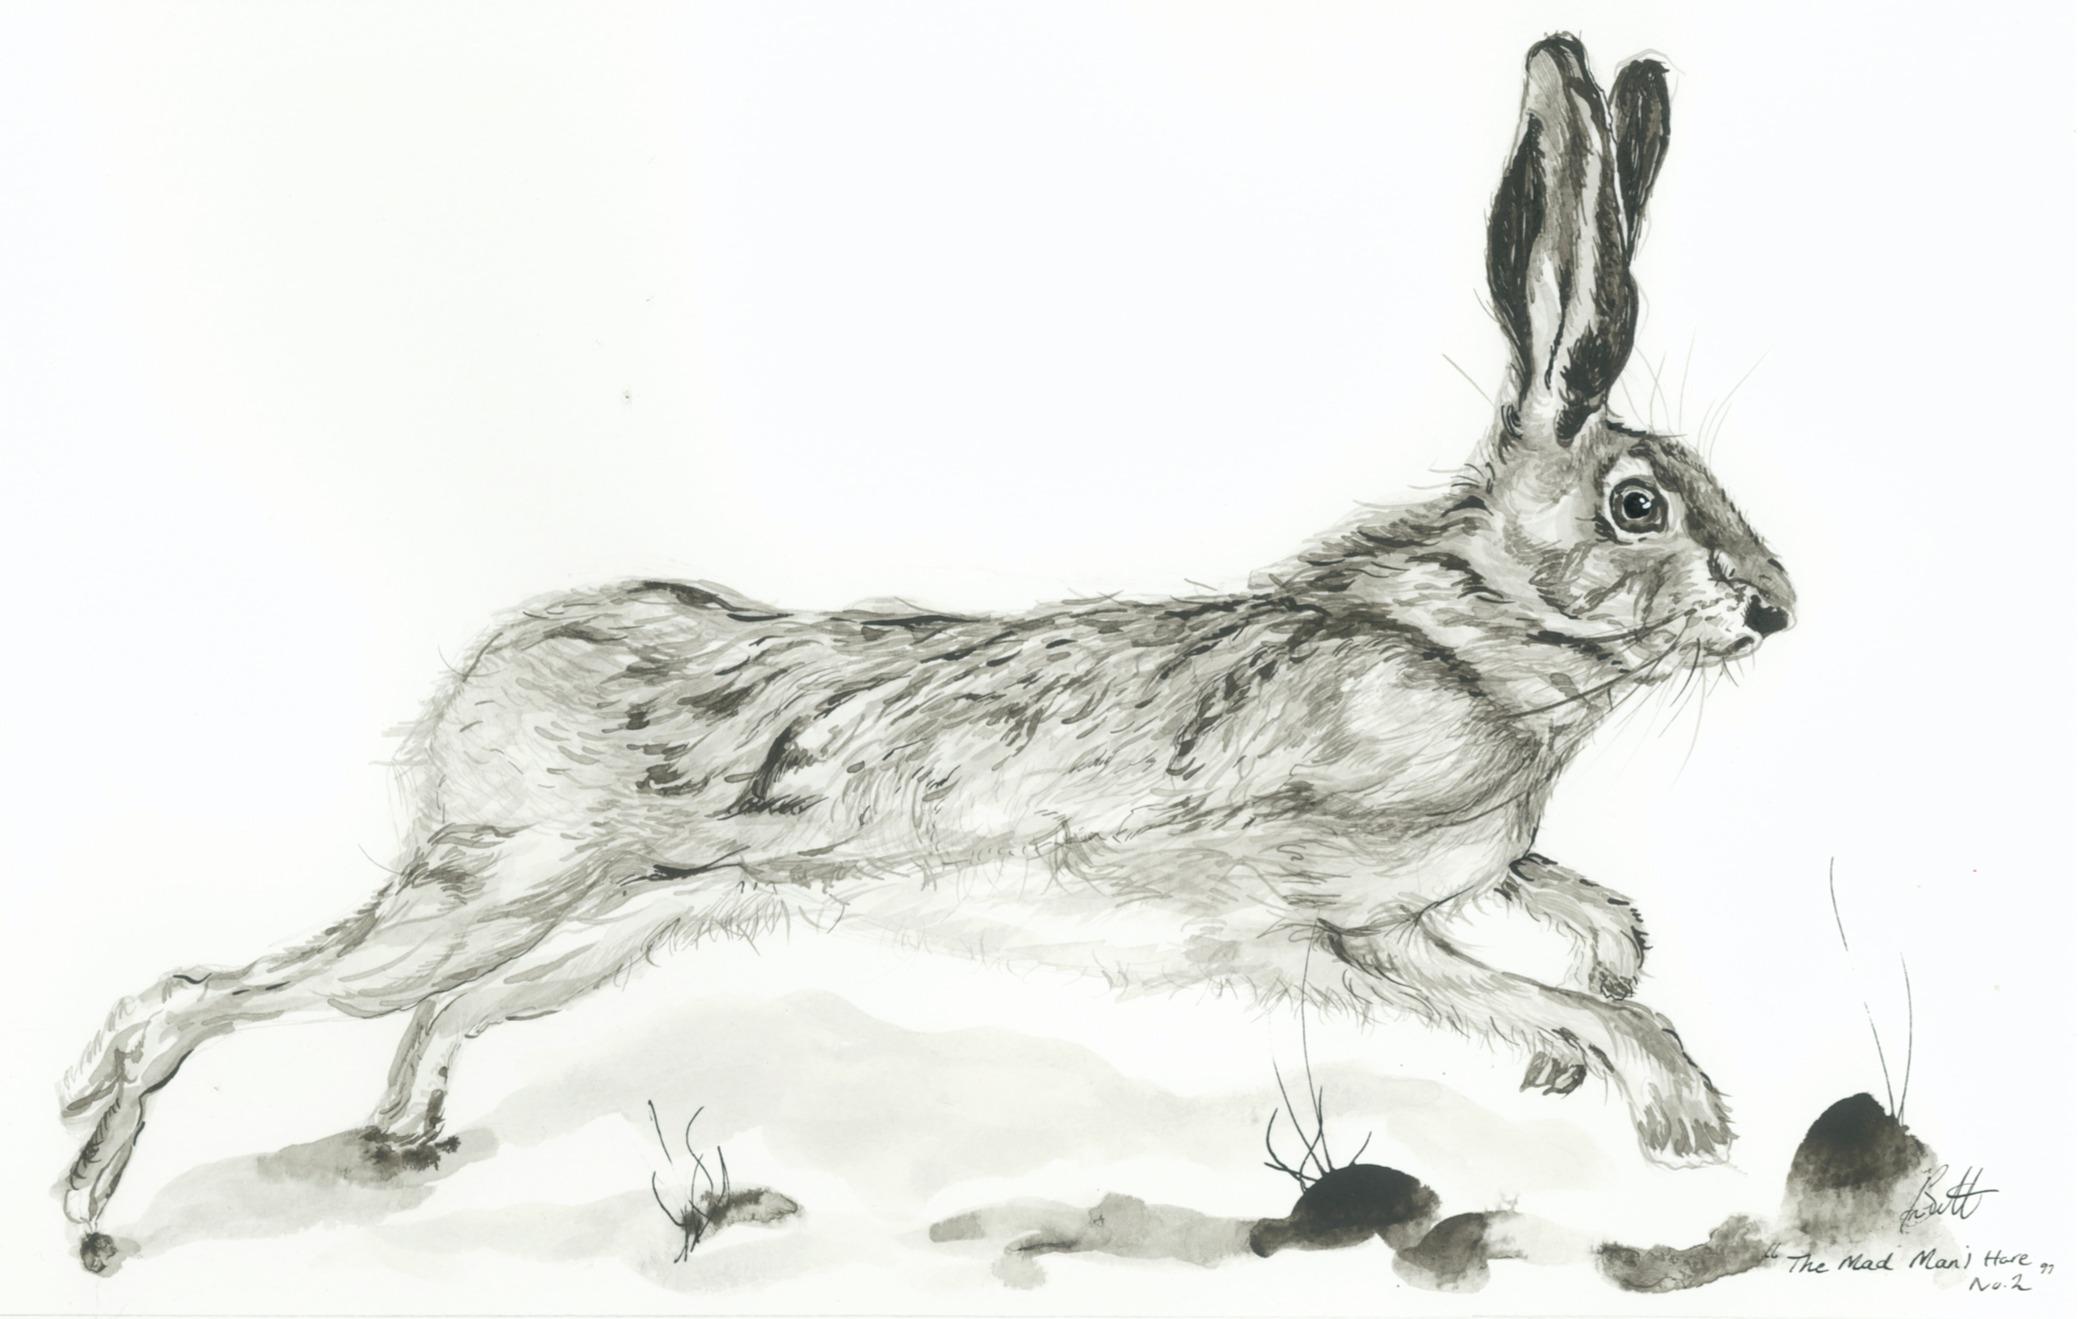 The Mad Manj Hare no.2